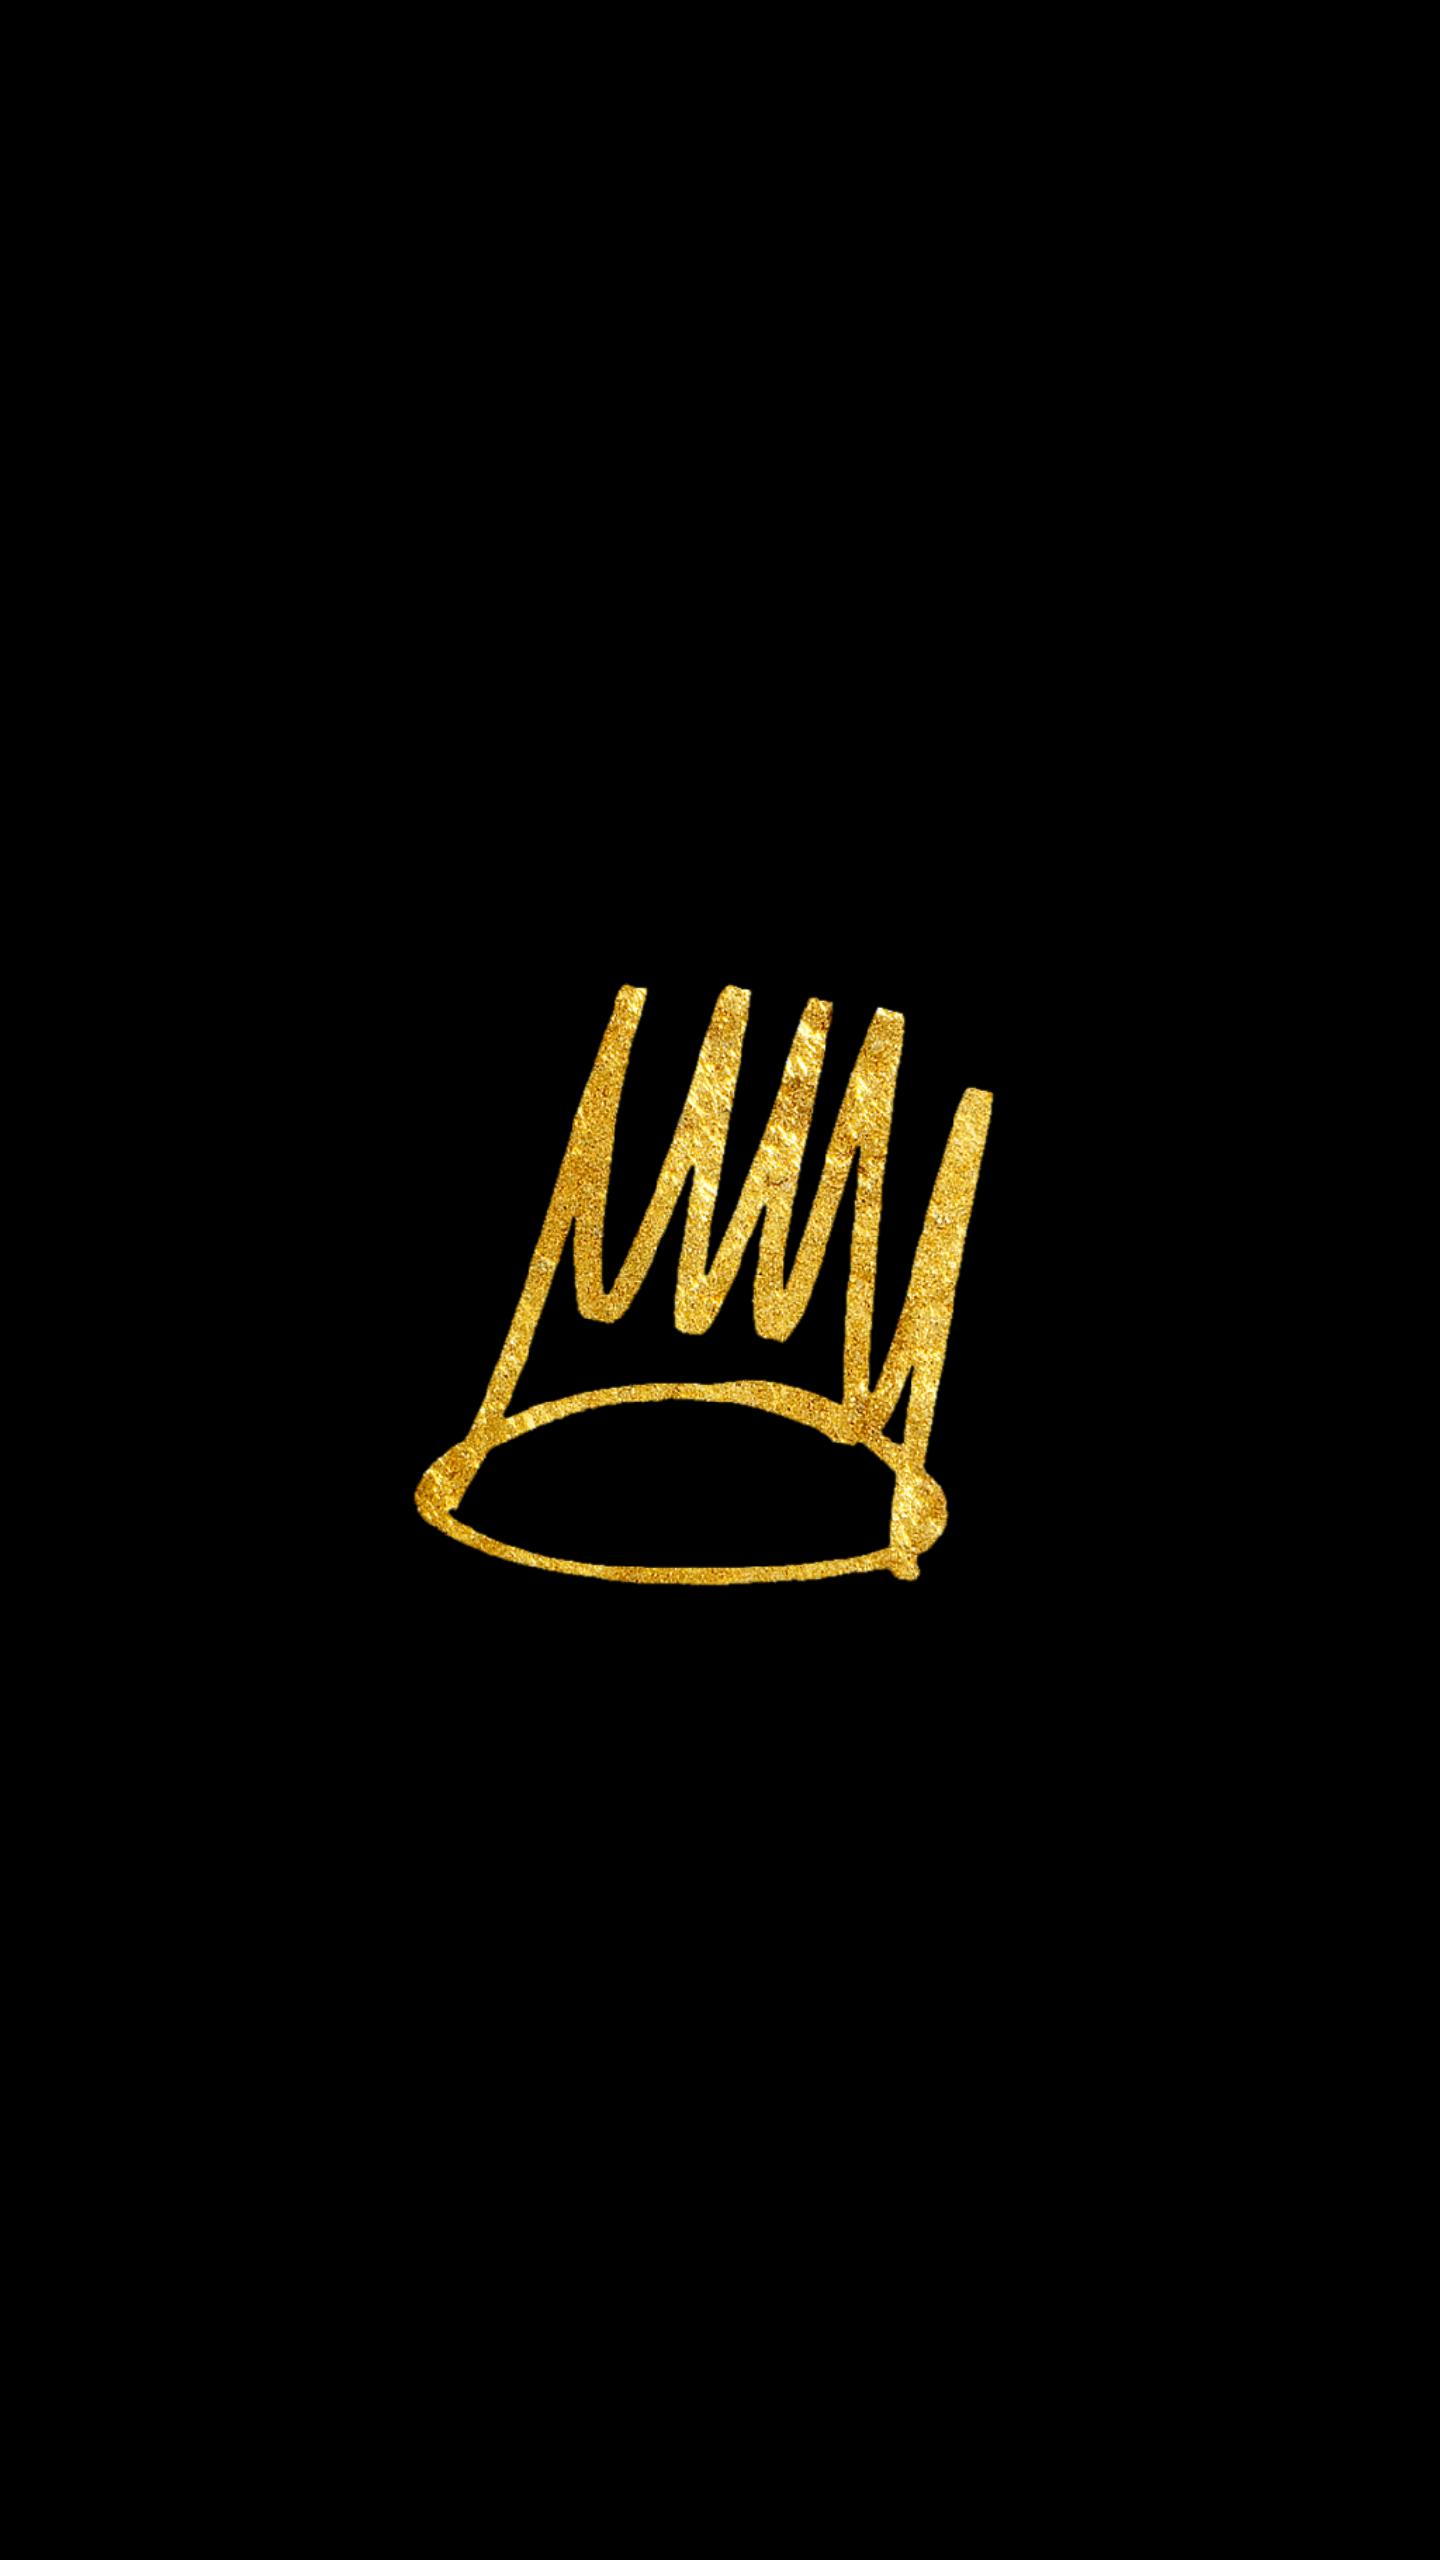 Pin By Kmatinx On J Cole J Cole Art J Cole J Cole Tattoos